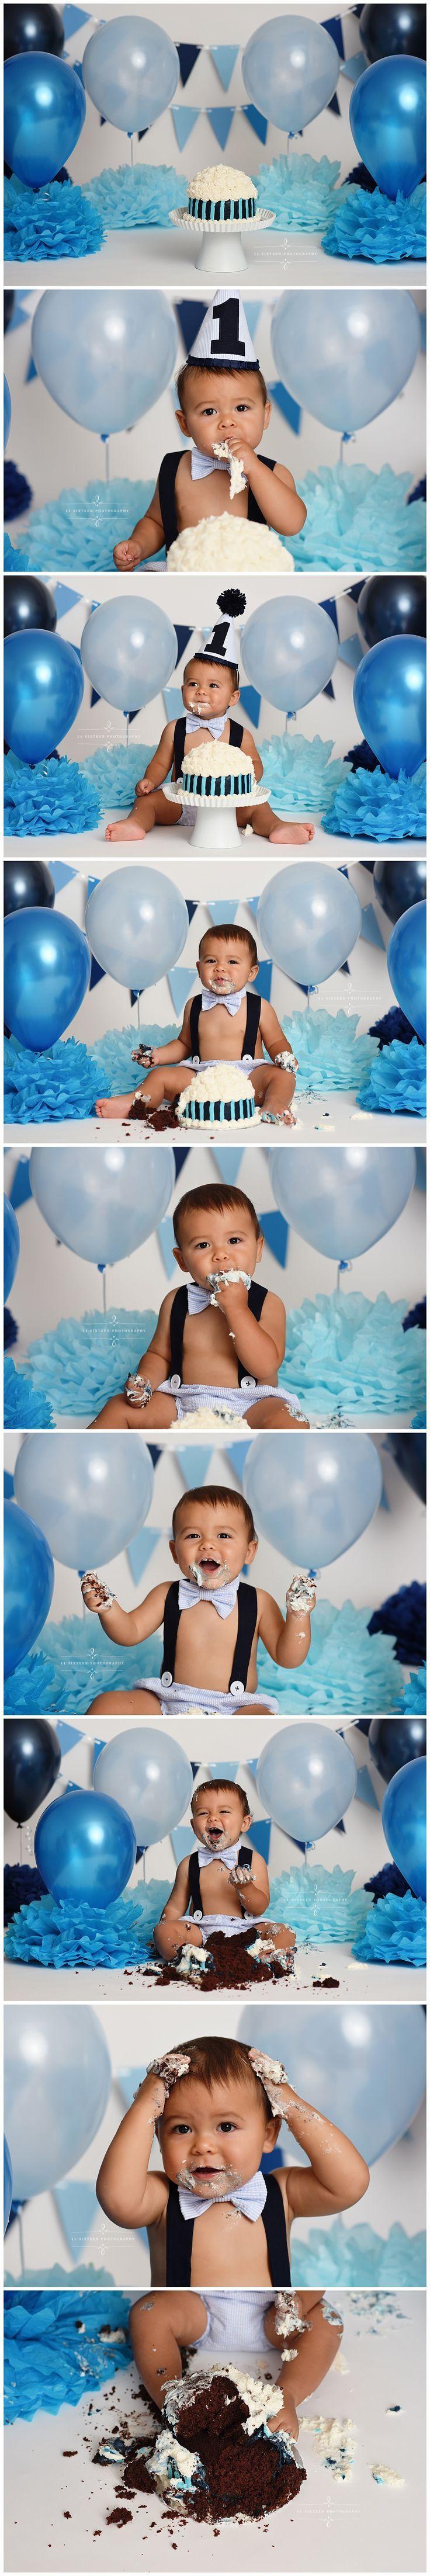 cake smash session, baby, boy, first birthday, hat, one, smashing, cake, balloons, banner, inspiration, ideas, setup, blue, navy, white, 11 Sixteen Photography, studio, professional, virginia, richmond